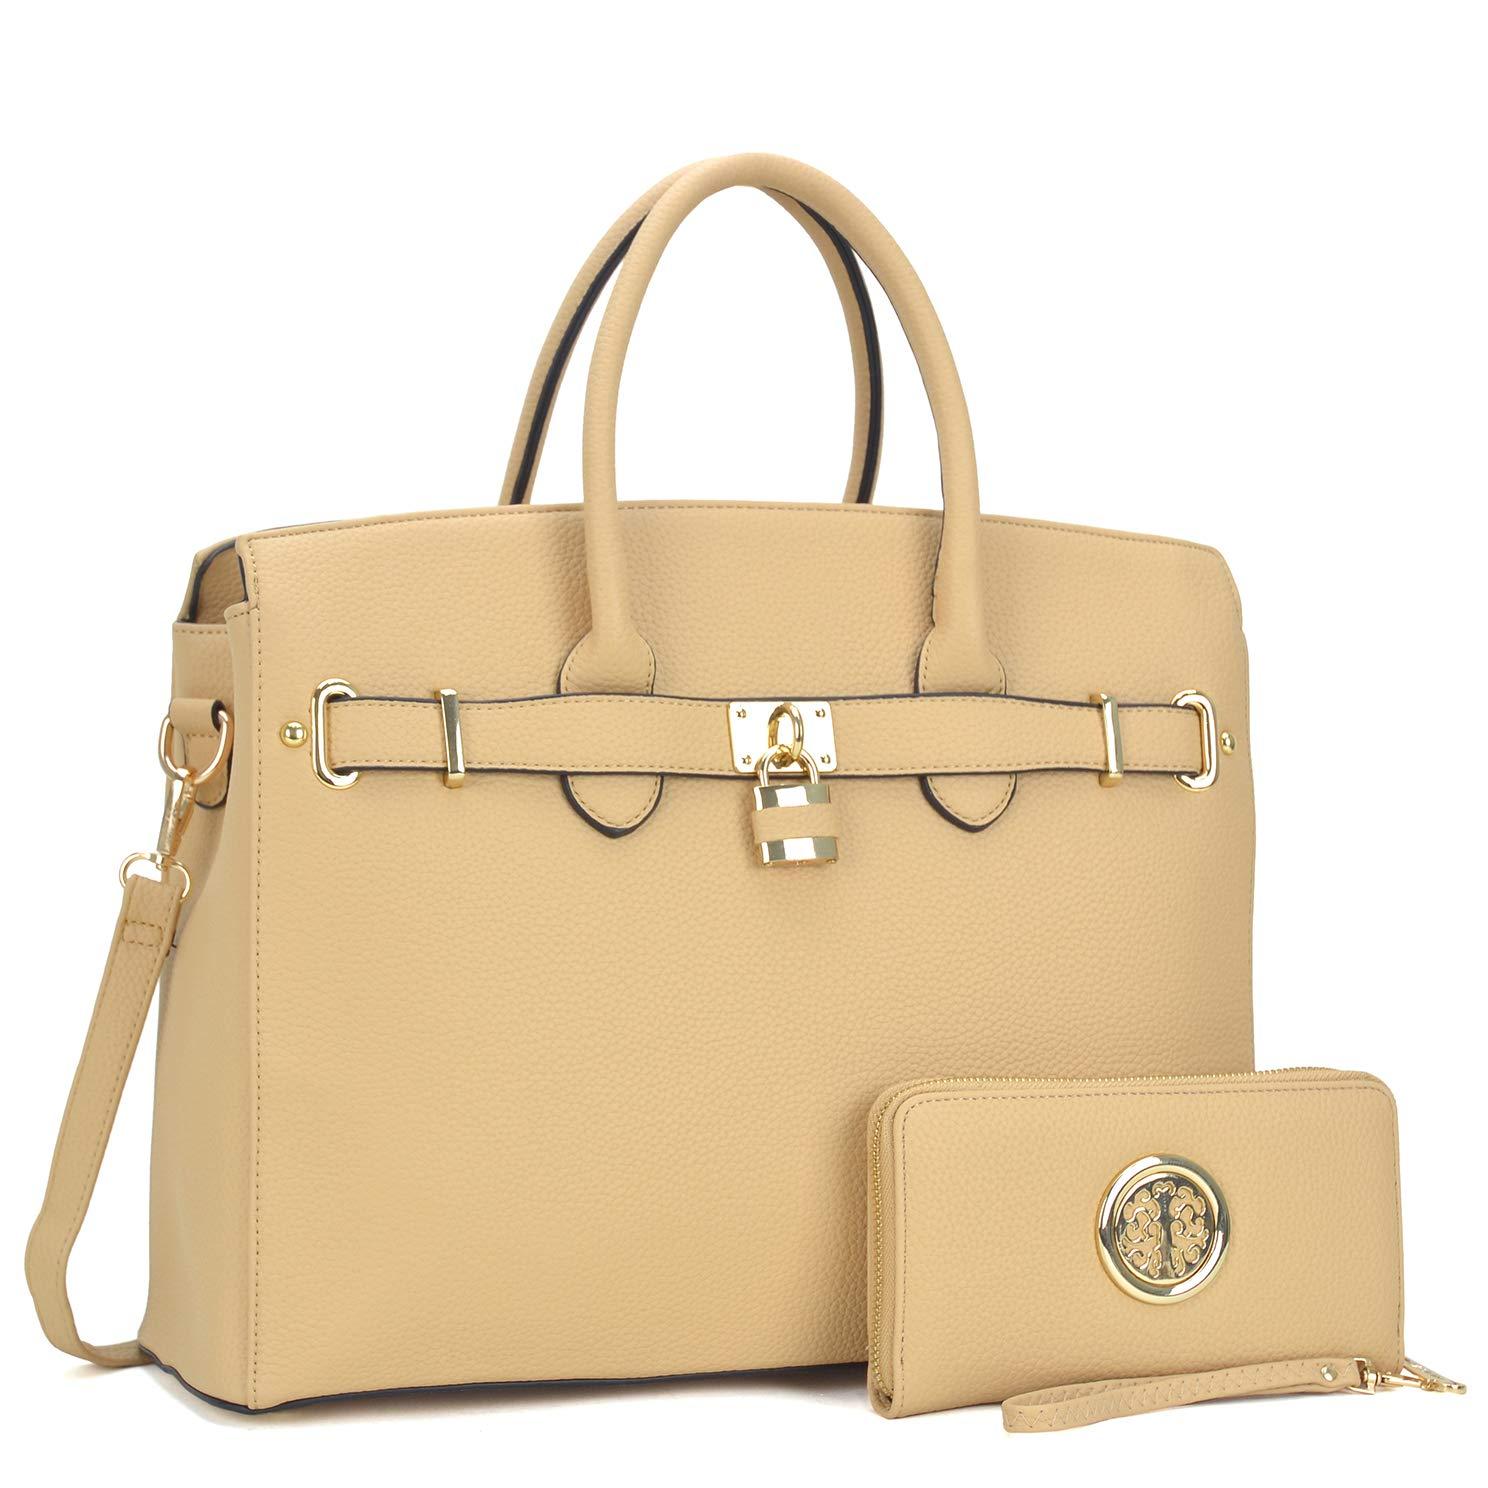 Women's Fashion Packlock Handbags Signature Designer Purse Designer Satchel handbag for Women(03-1006-W-TN)